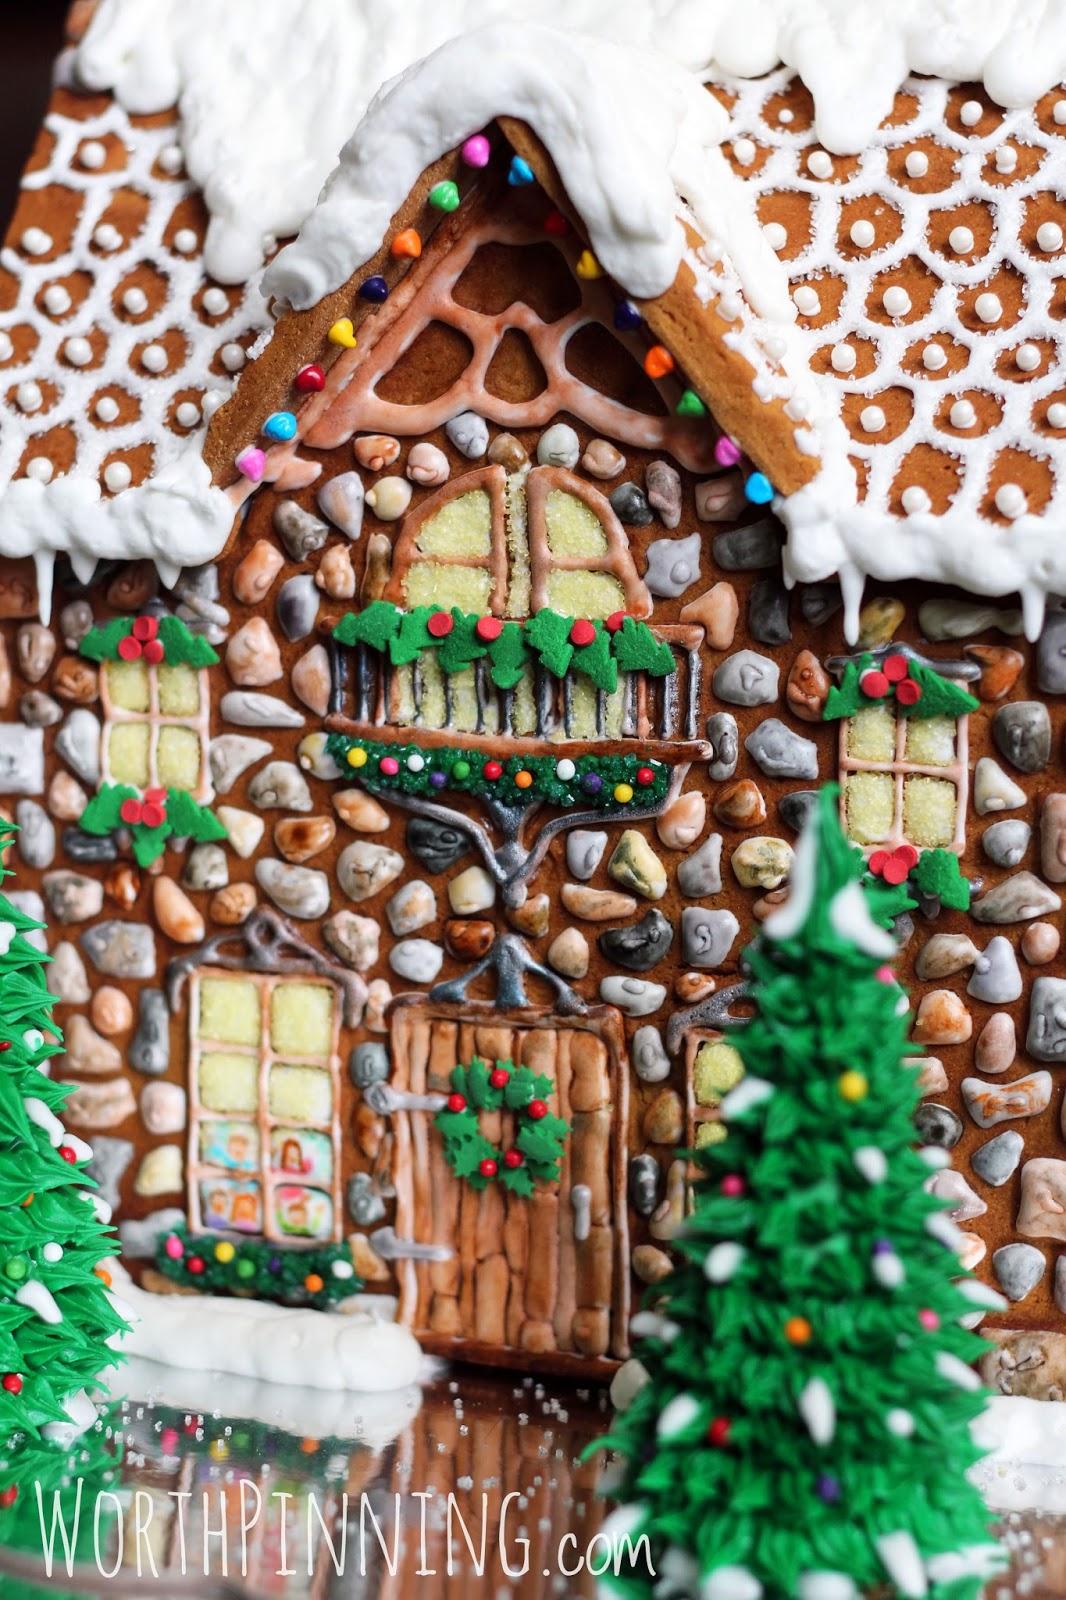 gingerbread2Bhouse2B20142BWorth2BPinning.jpg